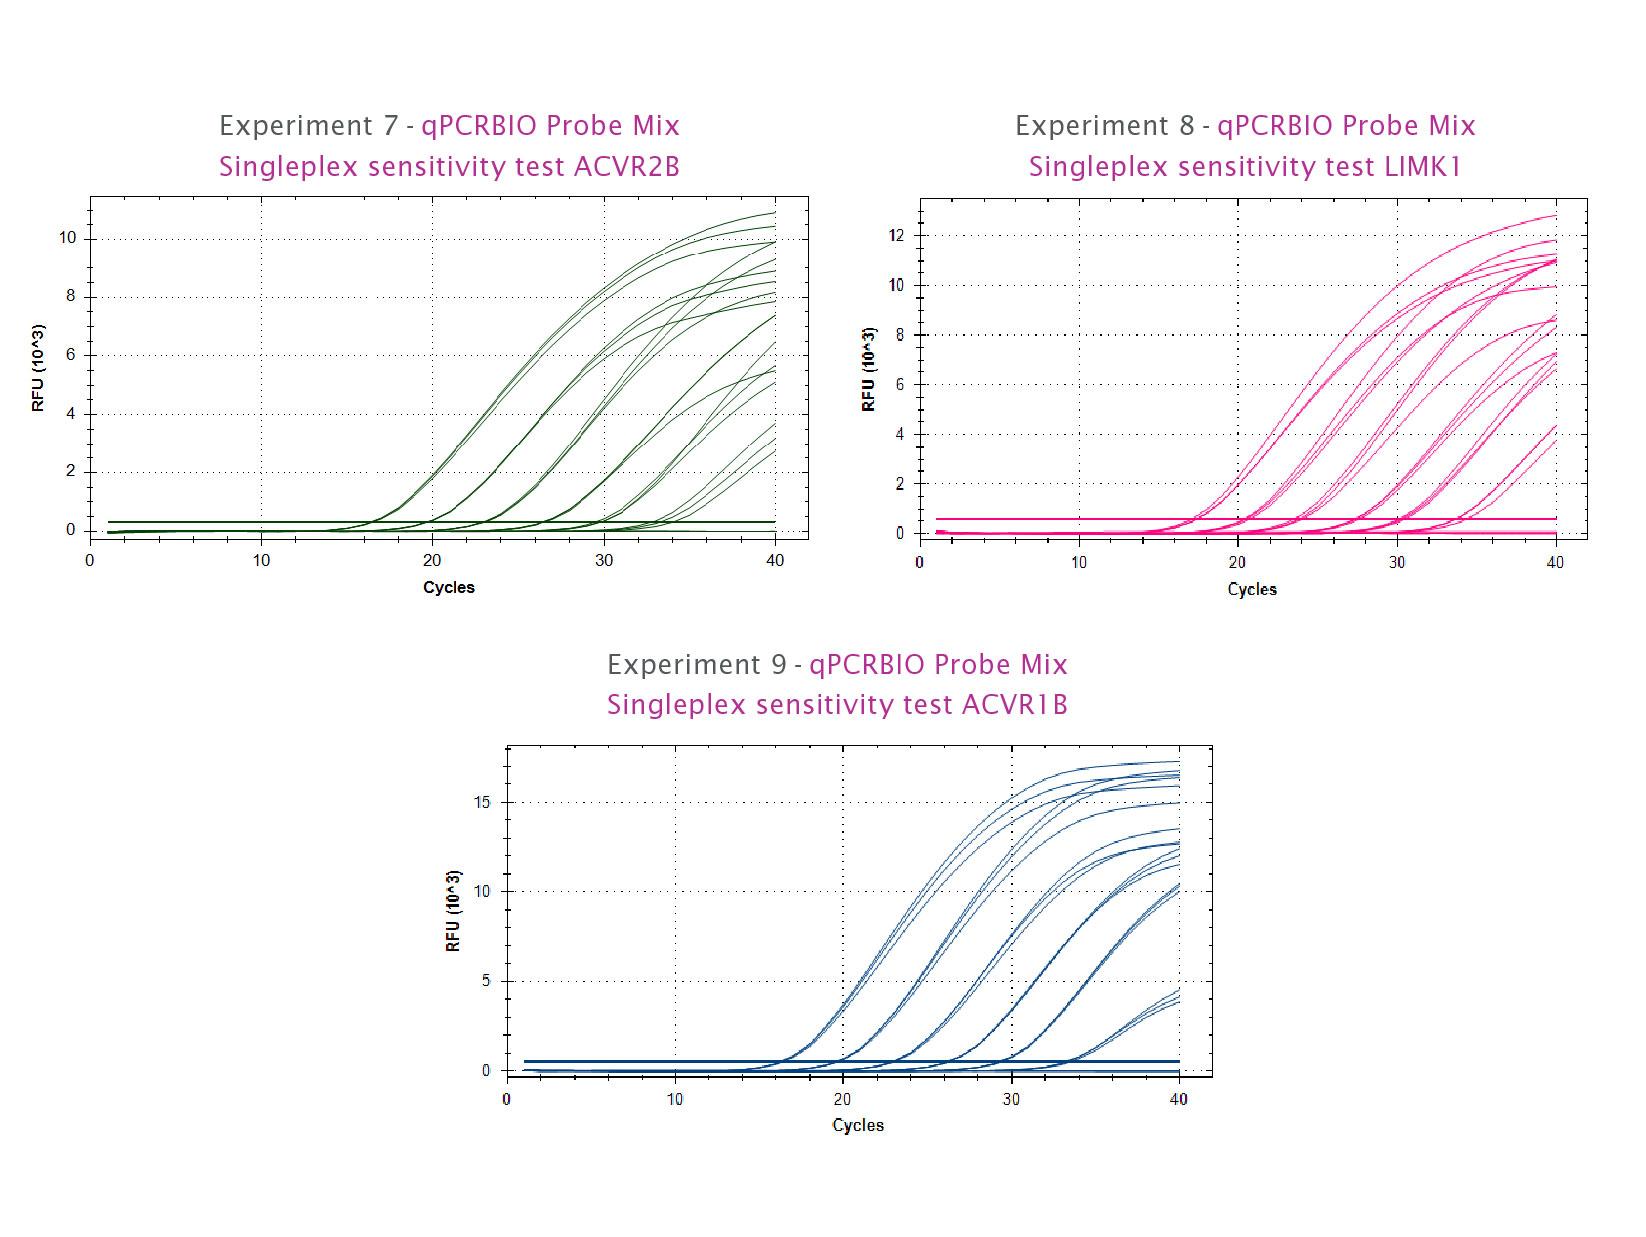 qPCRBIO Probe Mix in a singleplex sensitivity test